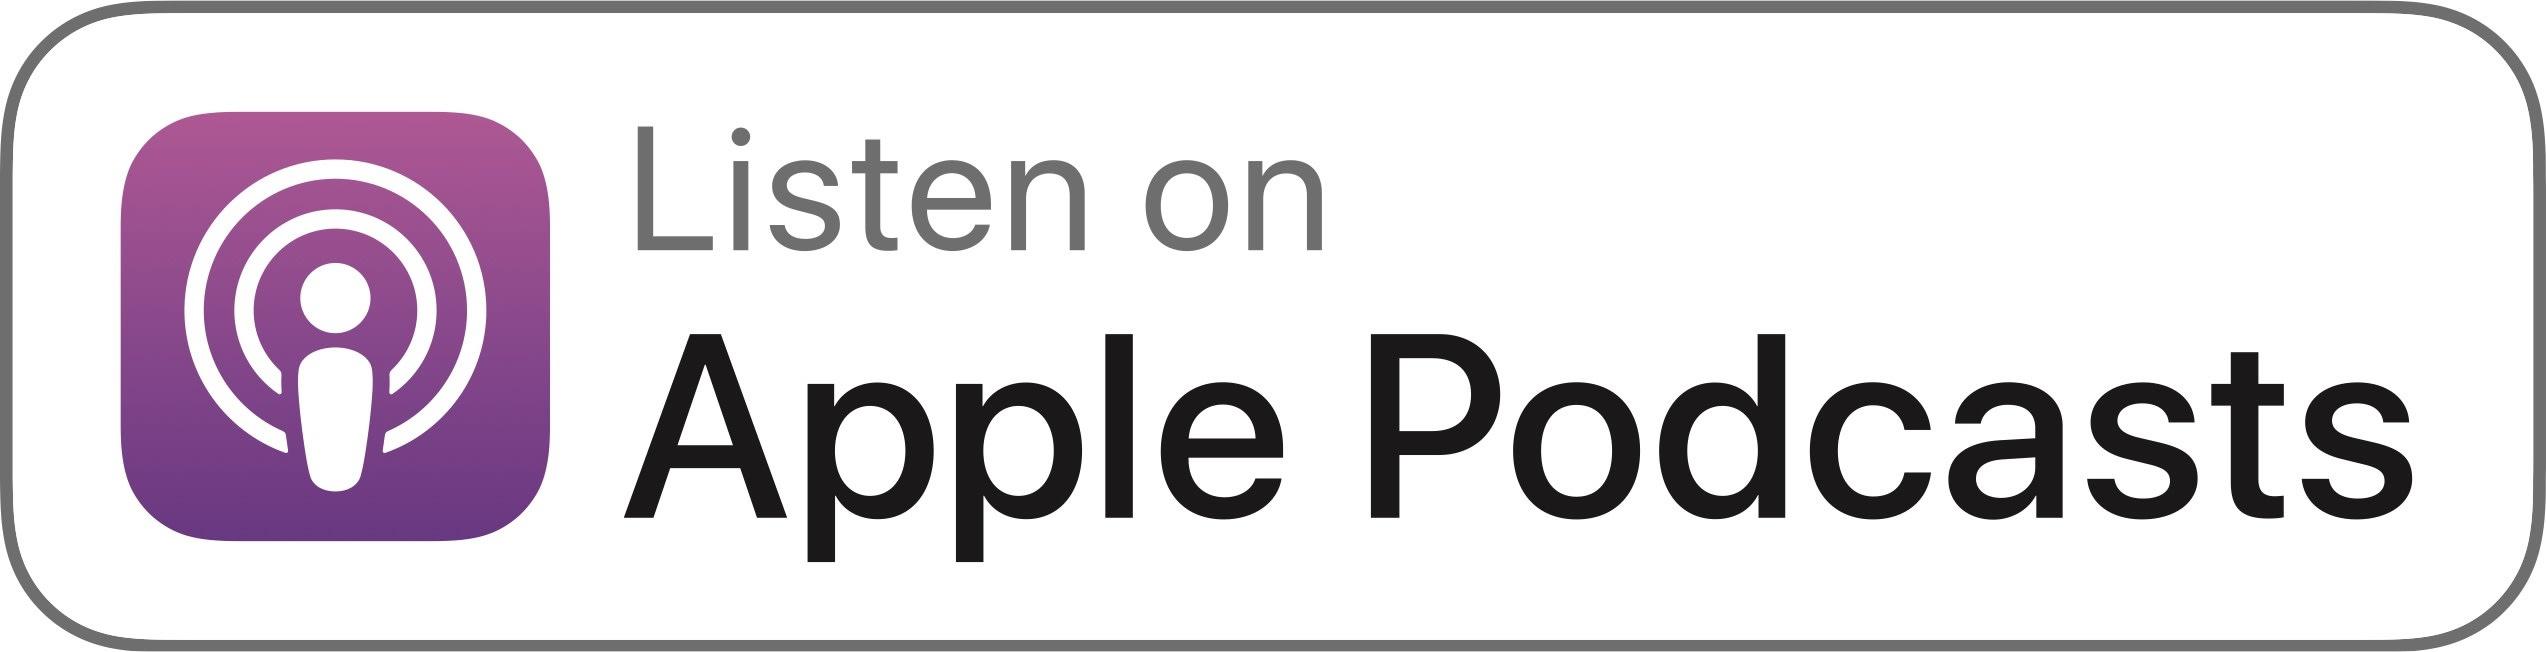 Car Repair Video Podcasts 2021